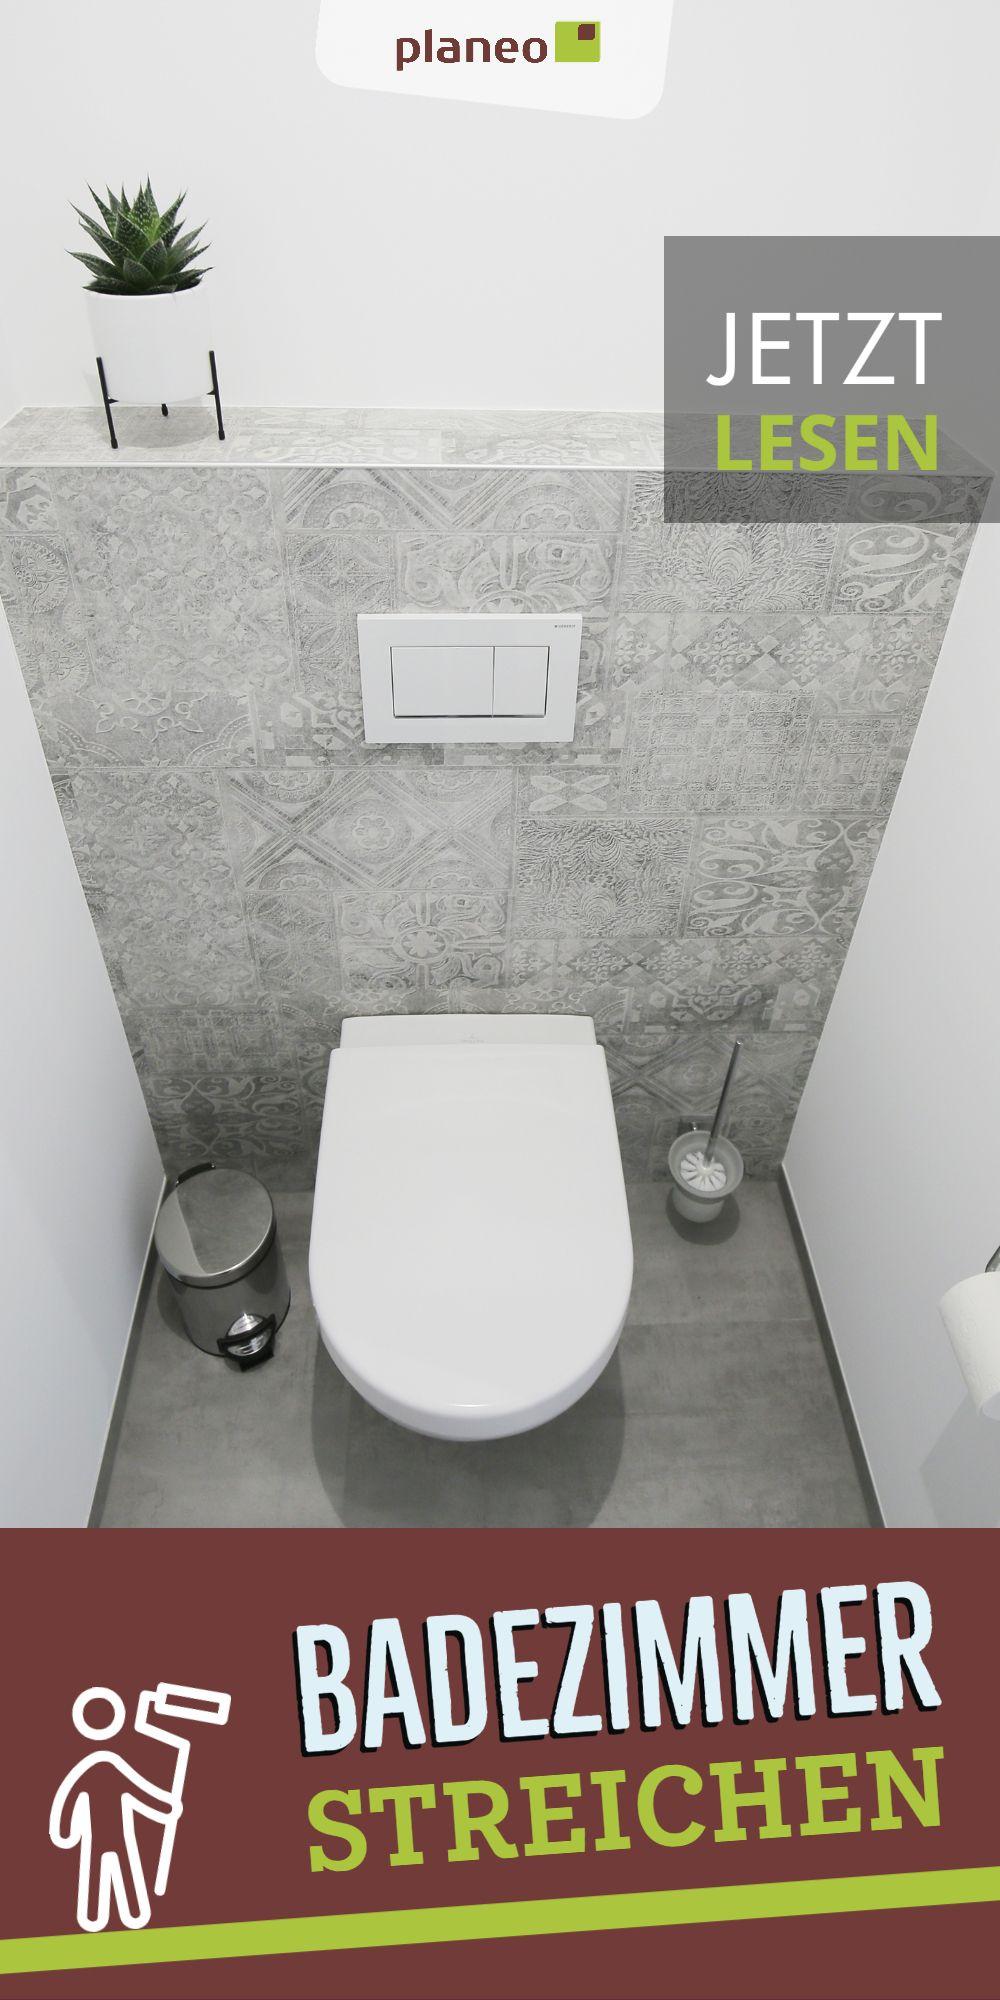 Badezimmer Streichen Welche Farbe Soll Man Nehmen Dispersionsfarbe Latexfarbe Silikatfarbe In 2020 Badezimmer Streichen Latexfarbe Badezimmer